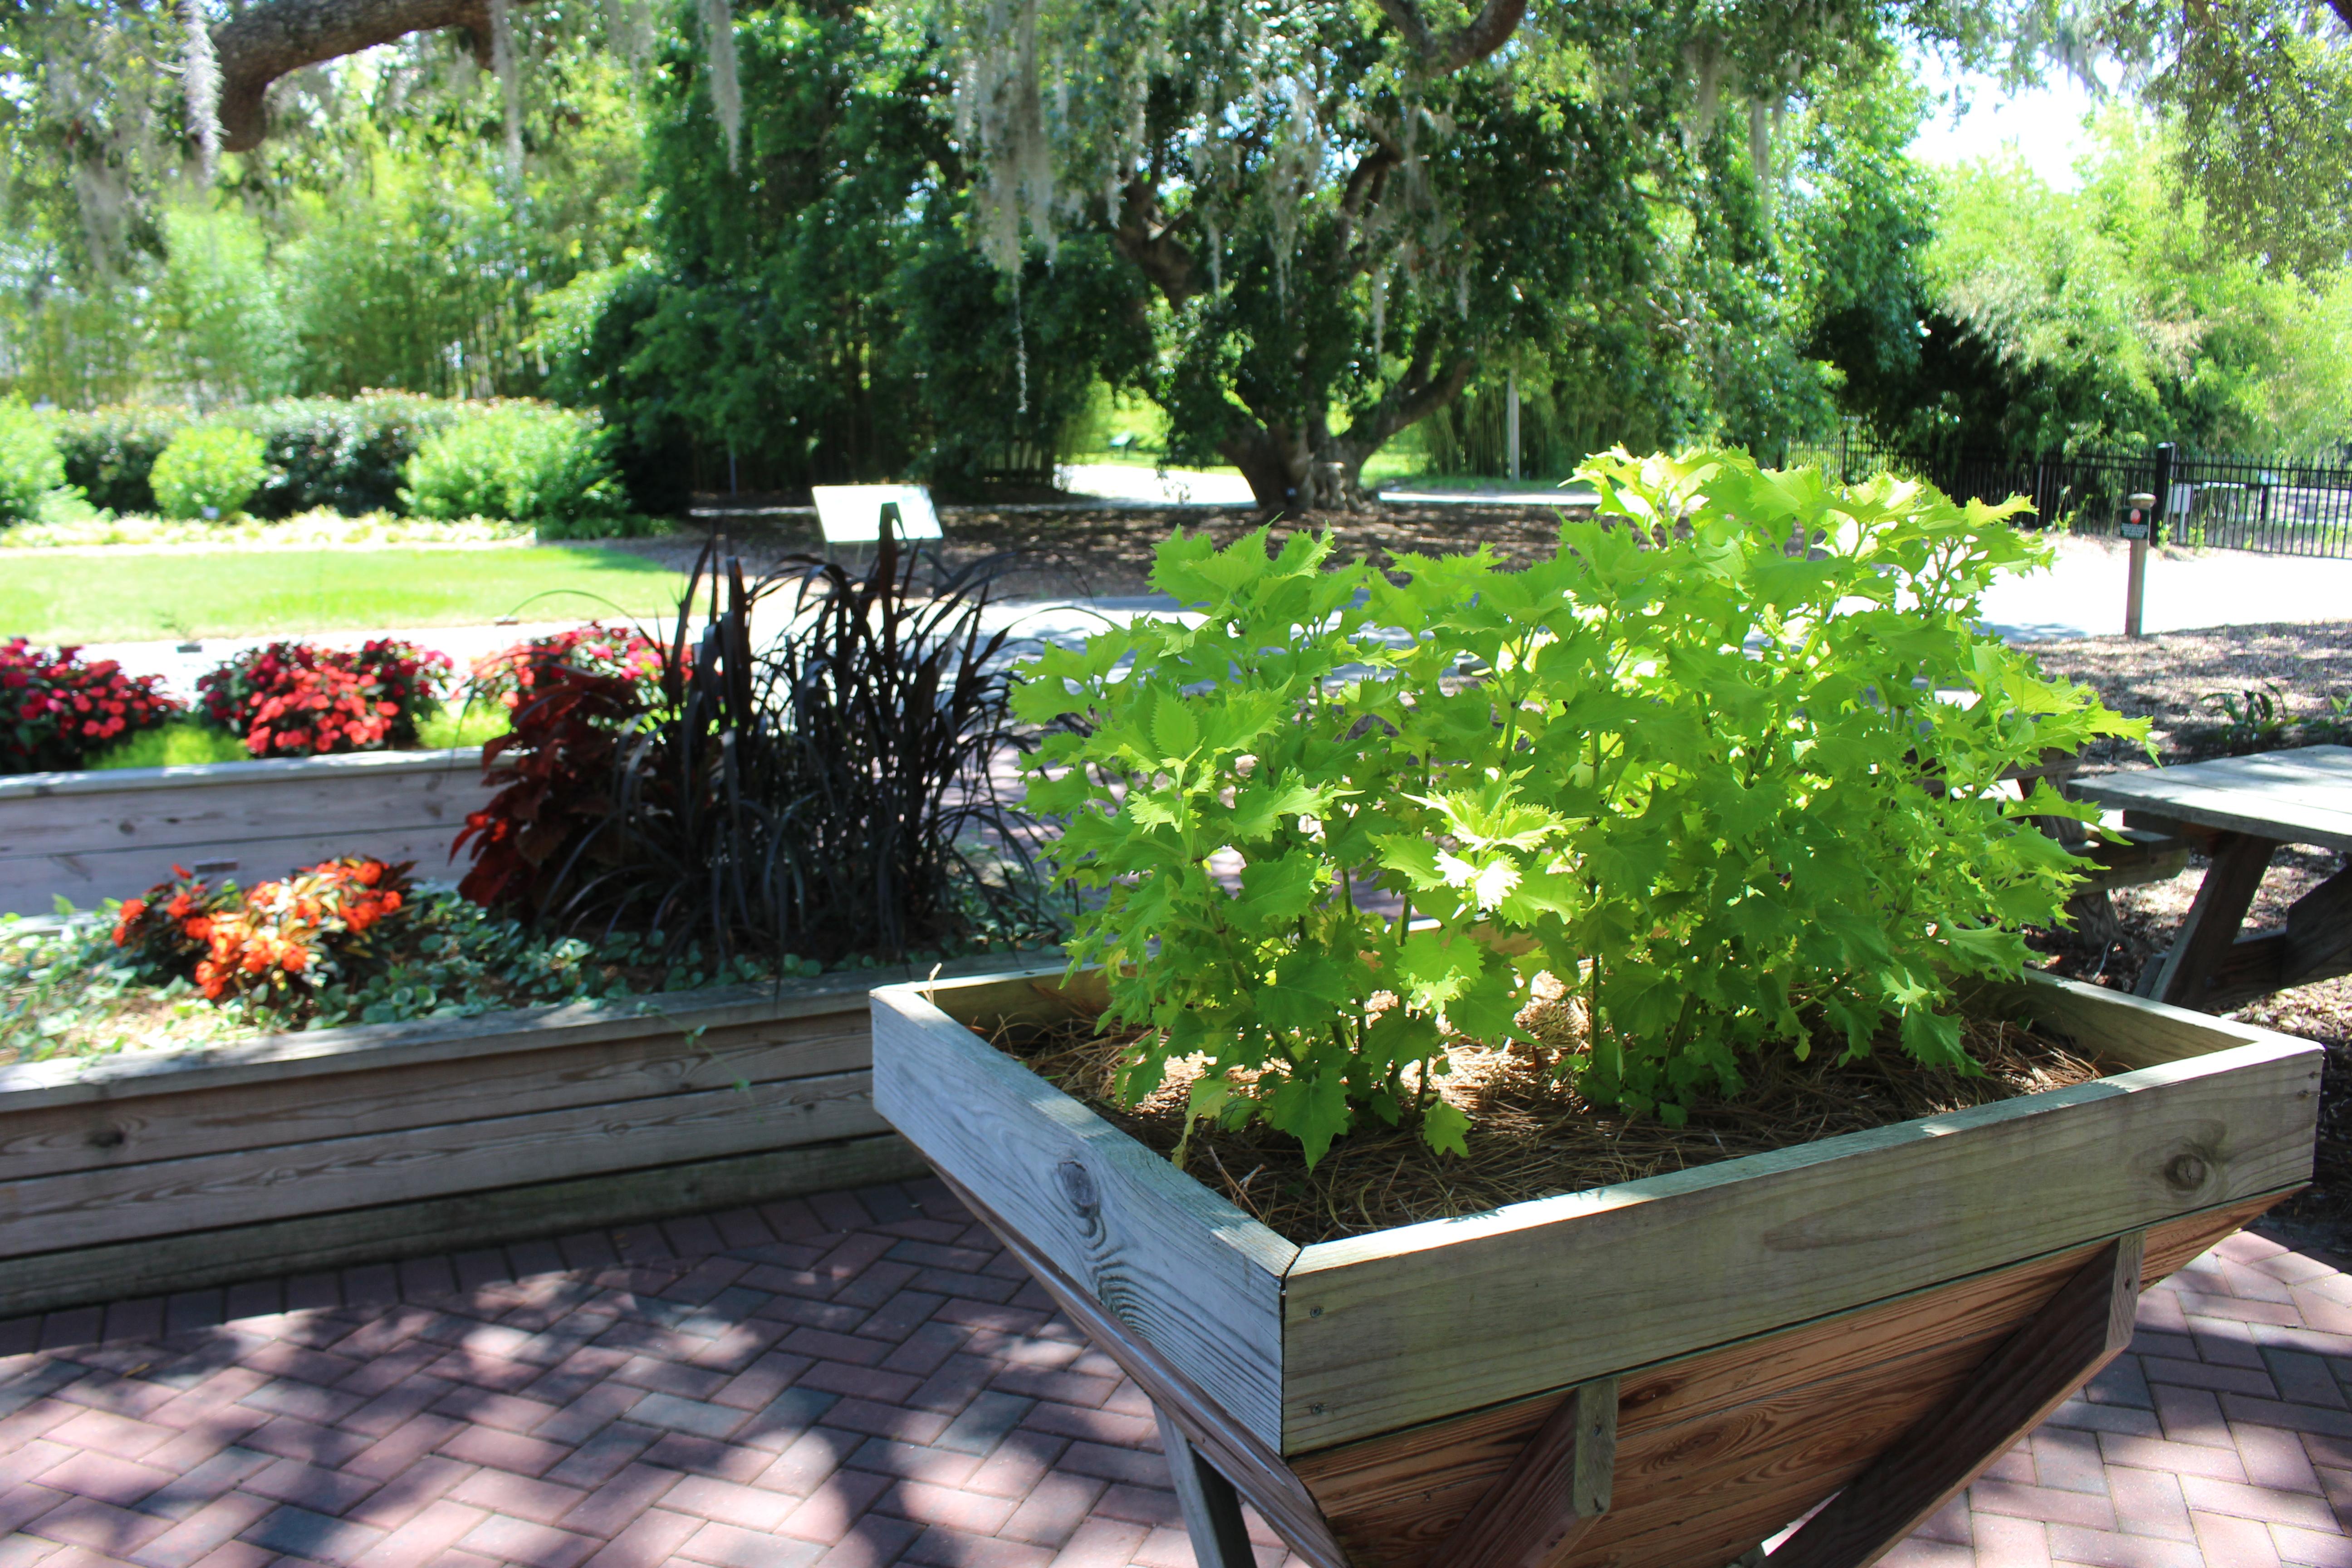 File:Coastal Georgia Botanical Gardens, Garden For All Abilities Raised  Planters 4